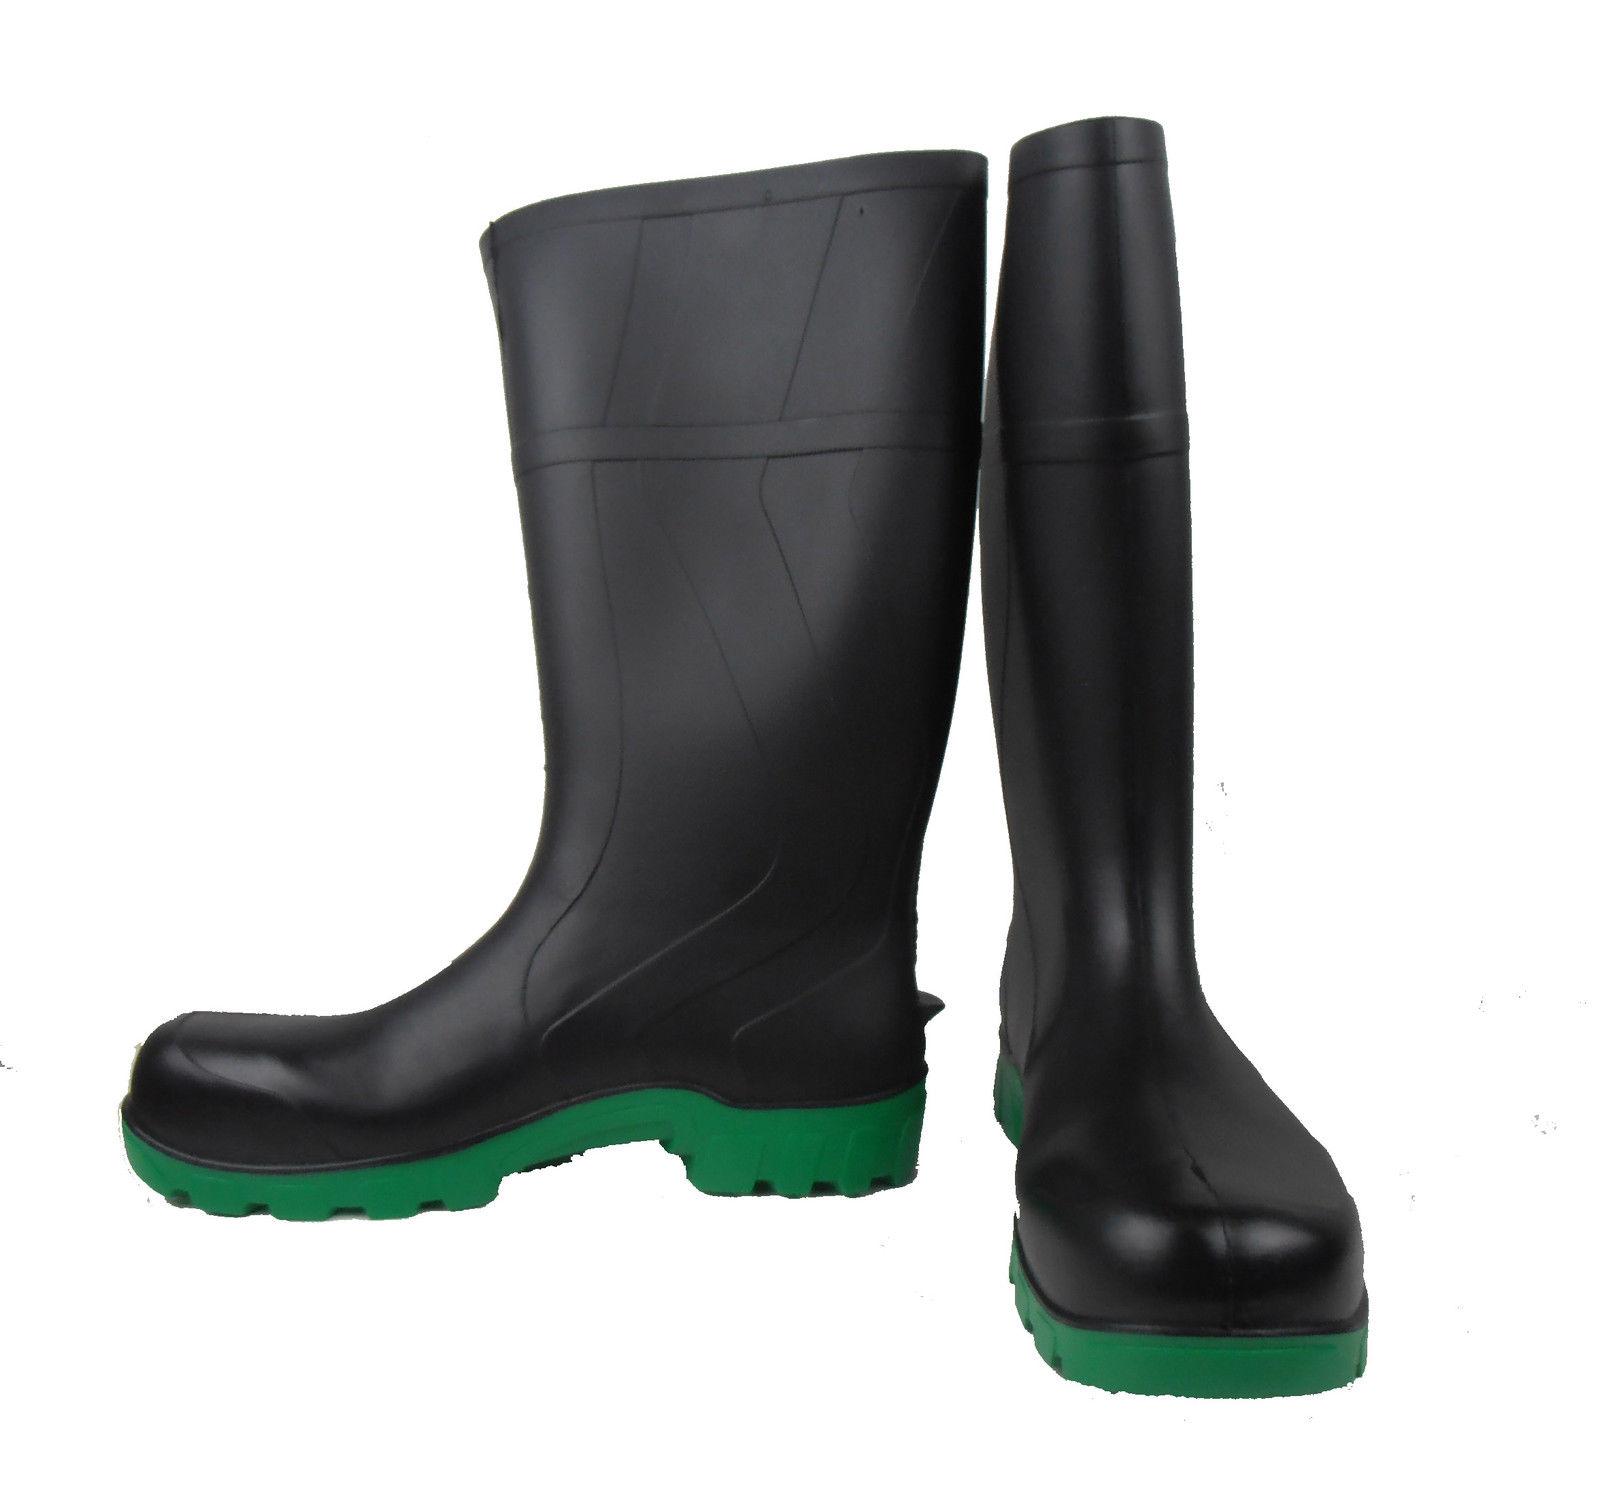 BLACK/GREEN KNEE BOOT